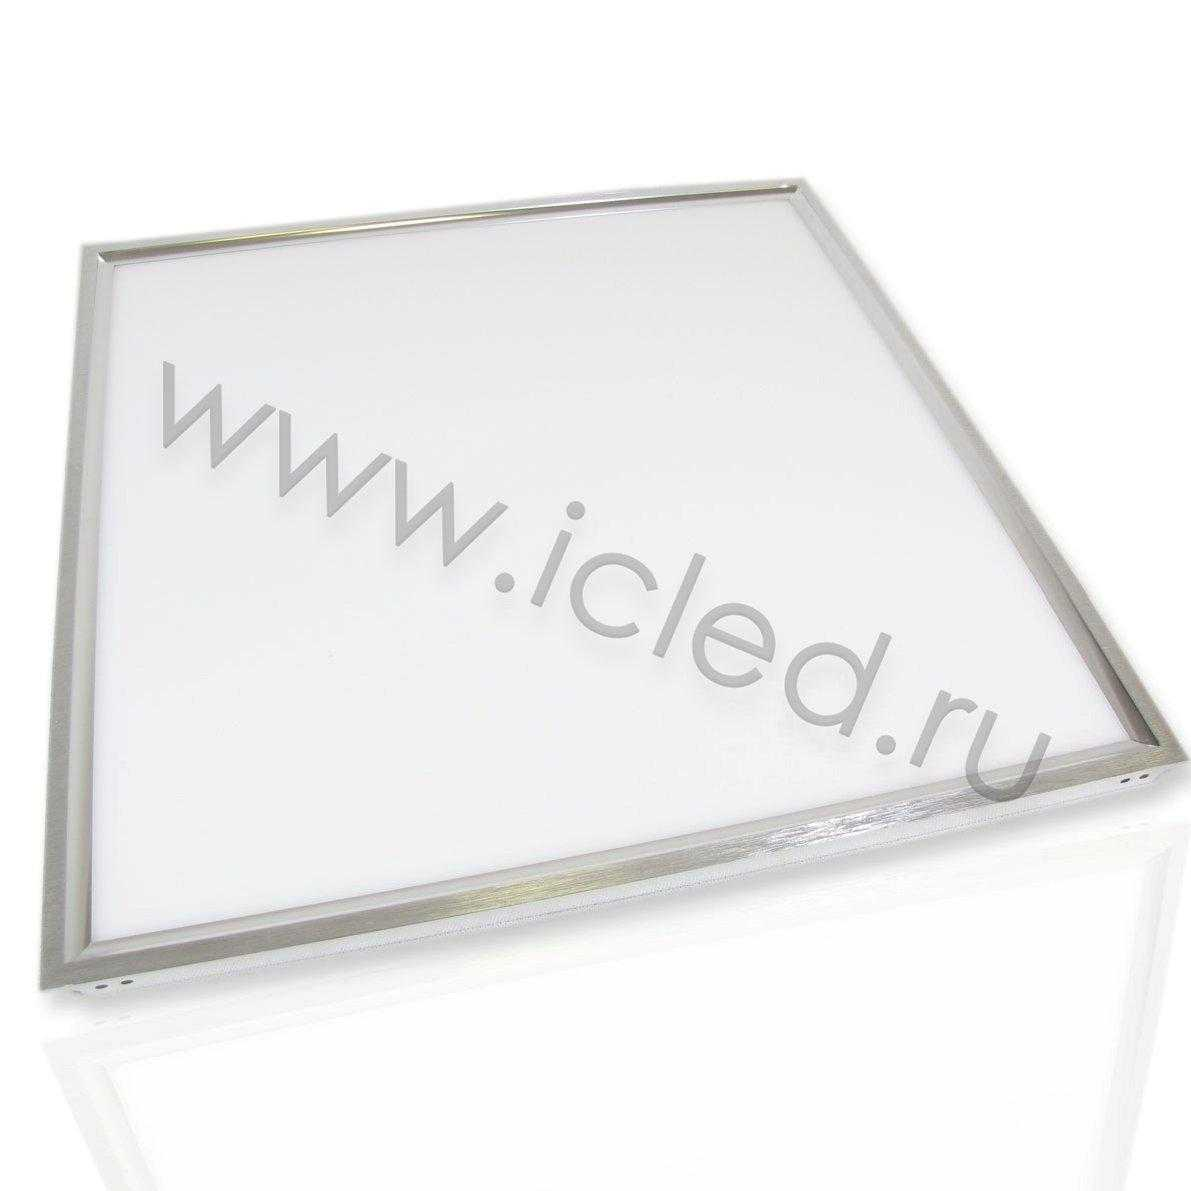 Светодиодная панель S L600 (42W, 220V, Warm White)